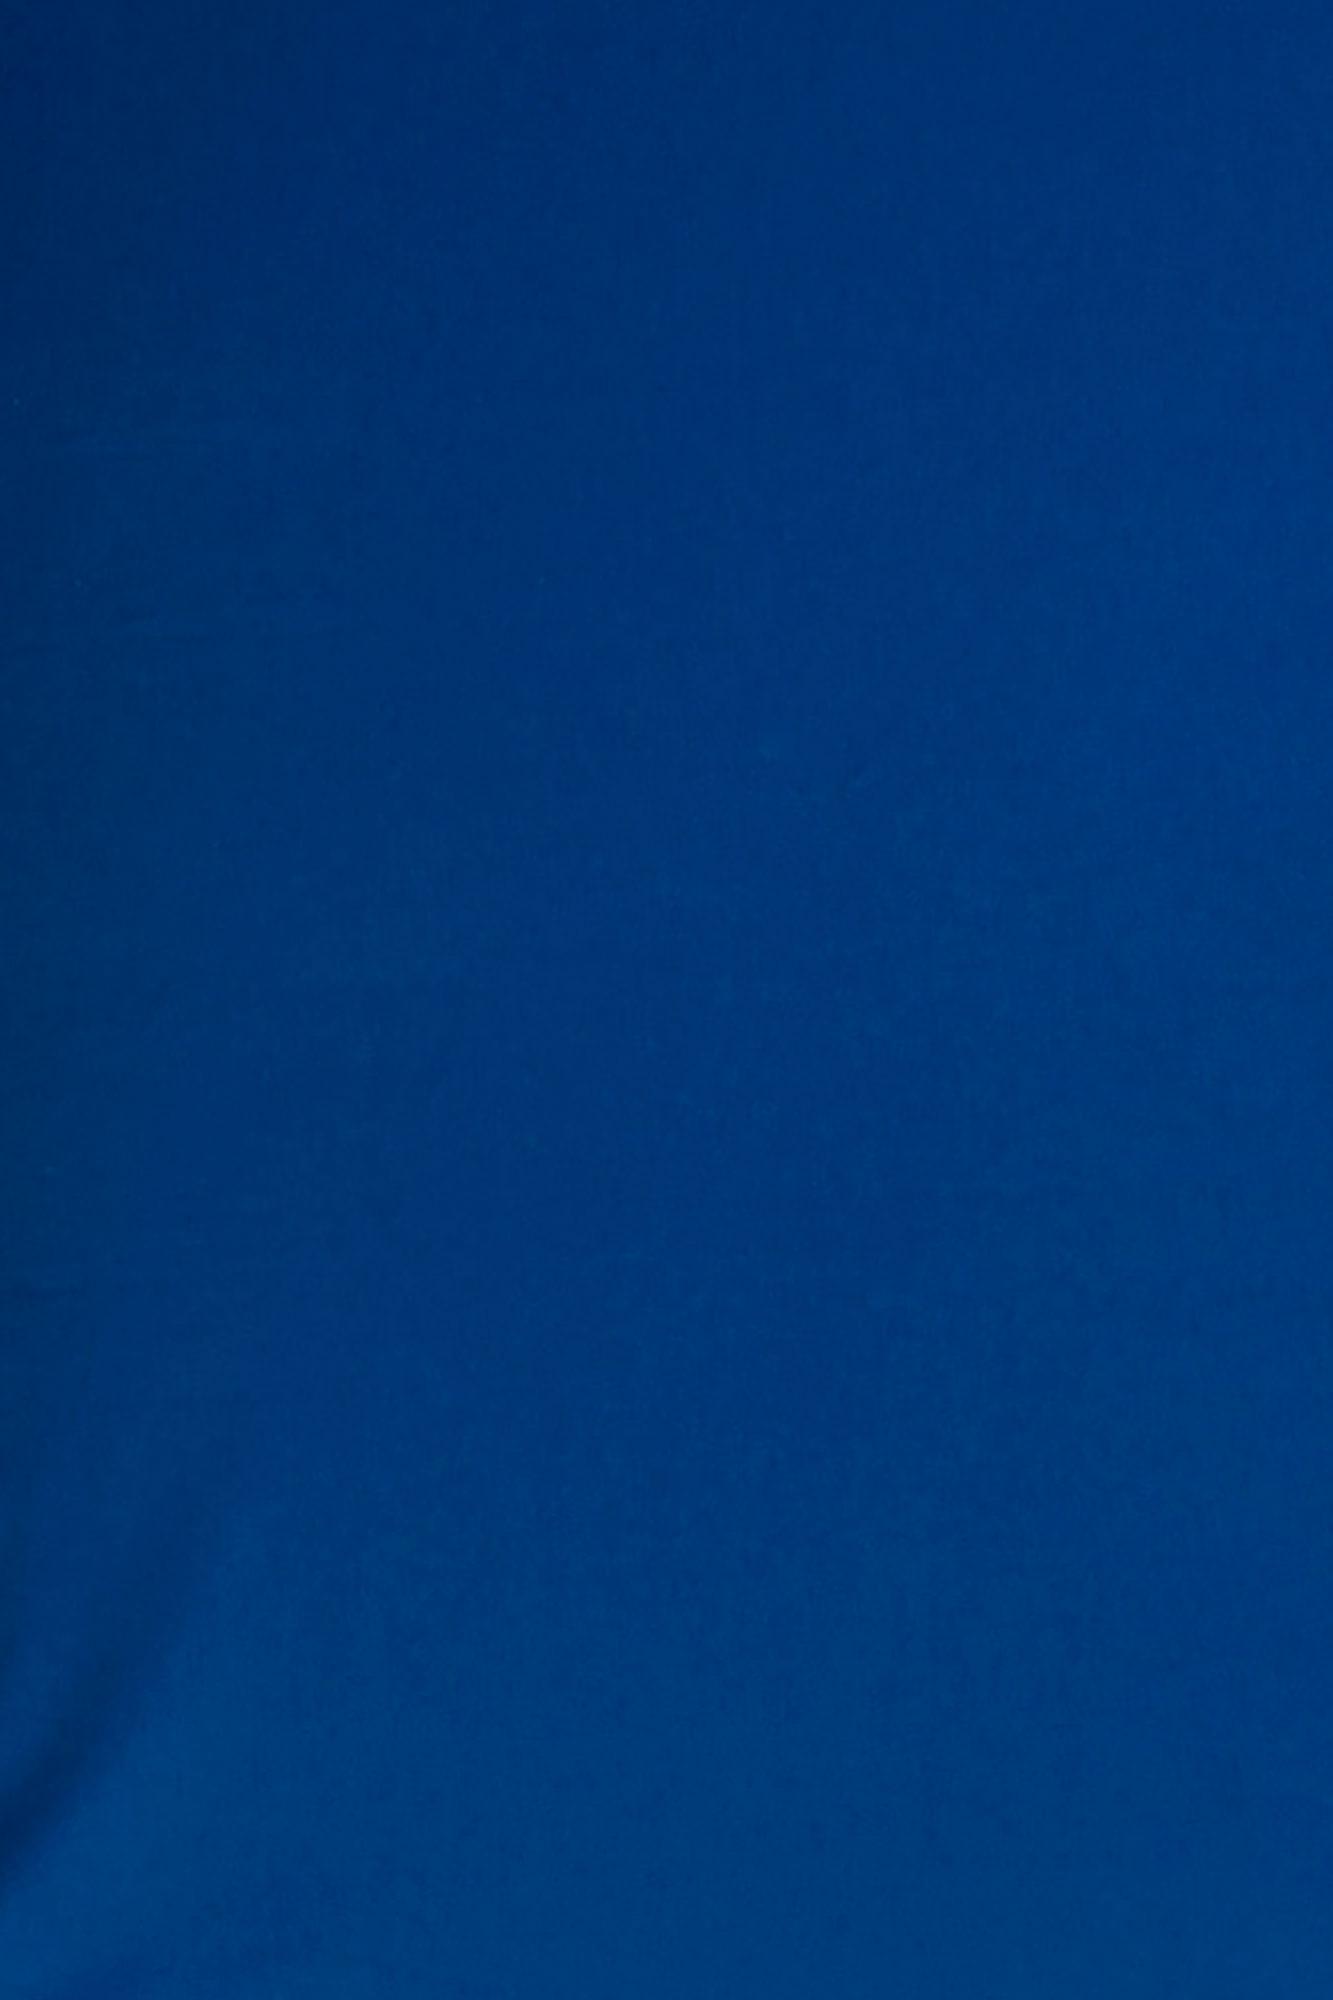 Lençol de elástico solteiro Azul clássico (sarja)